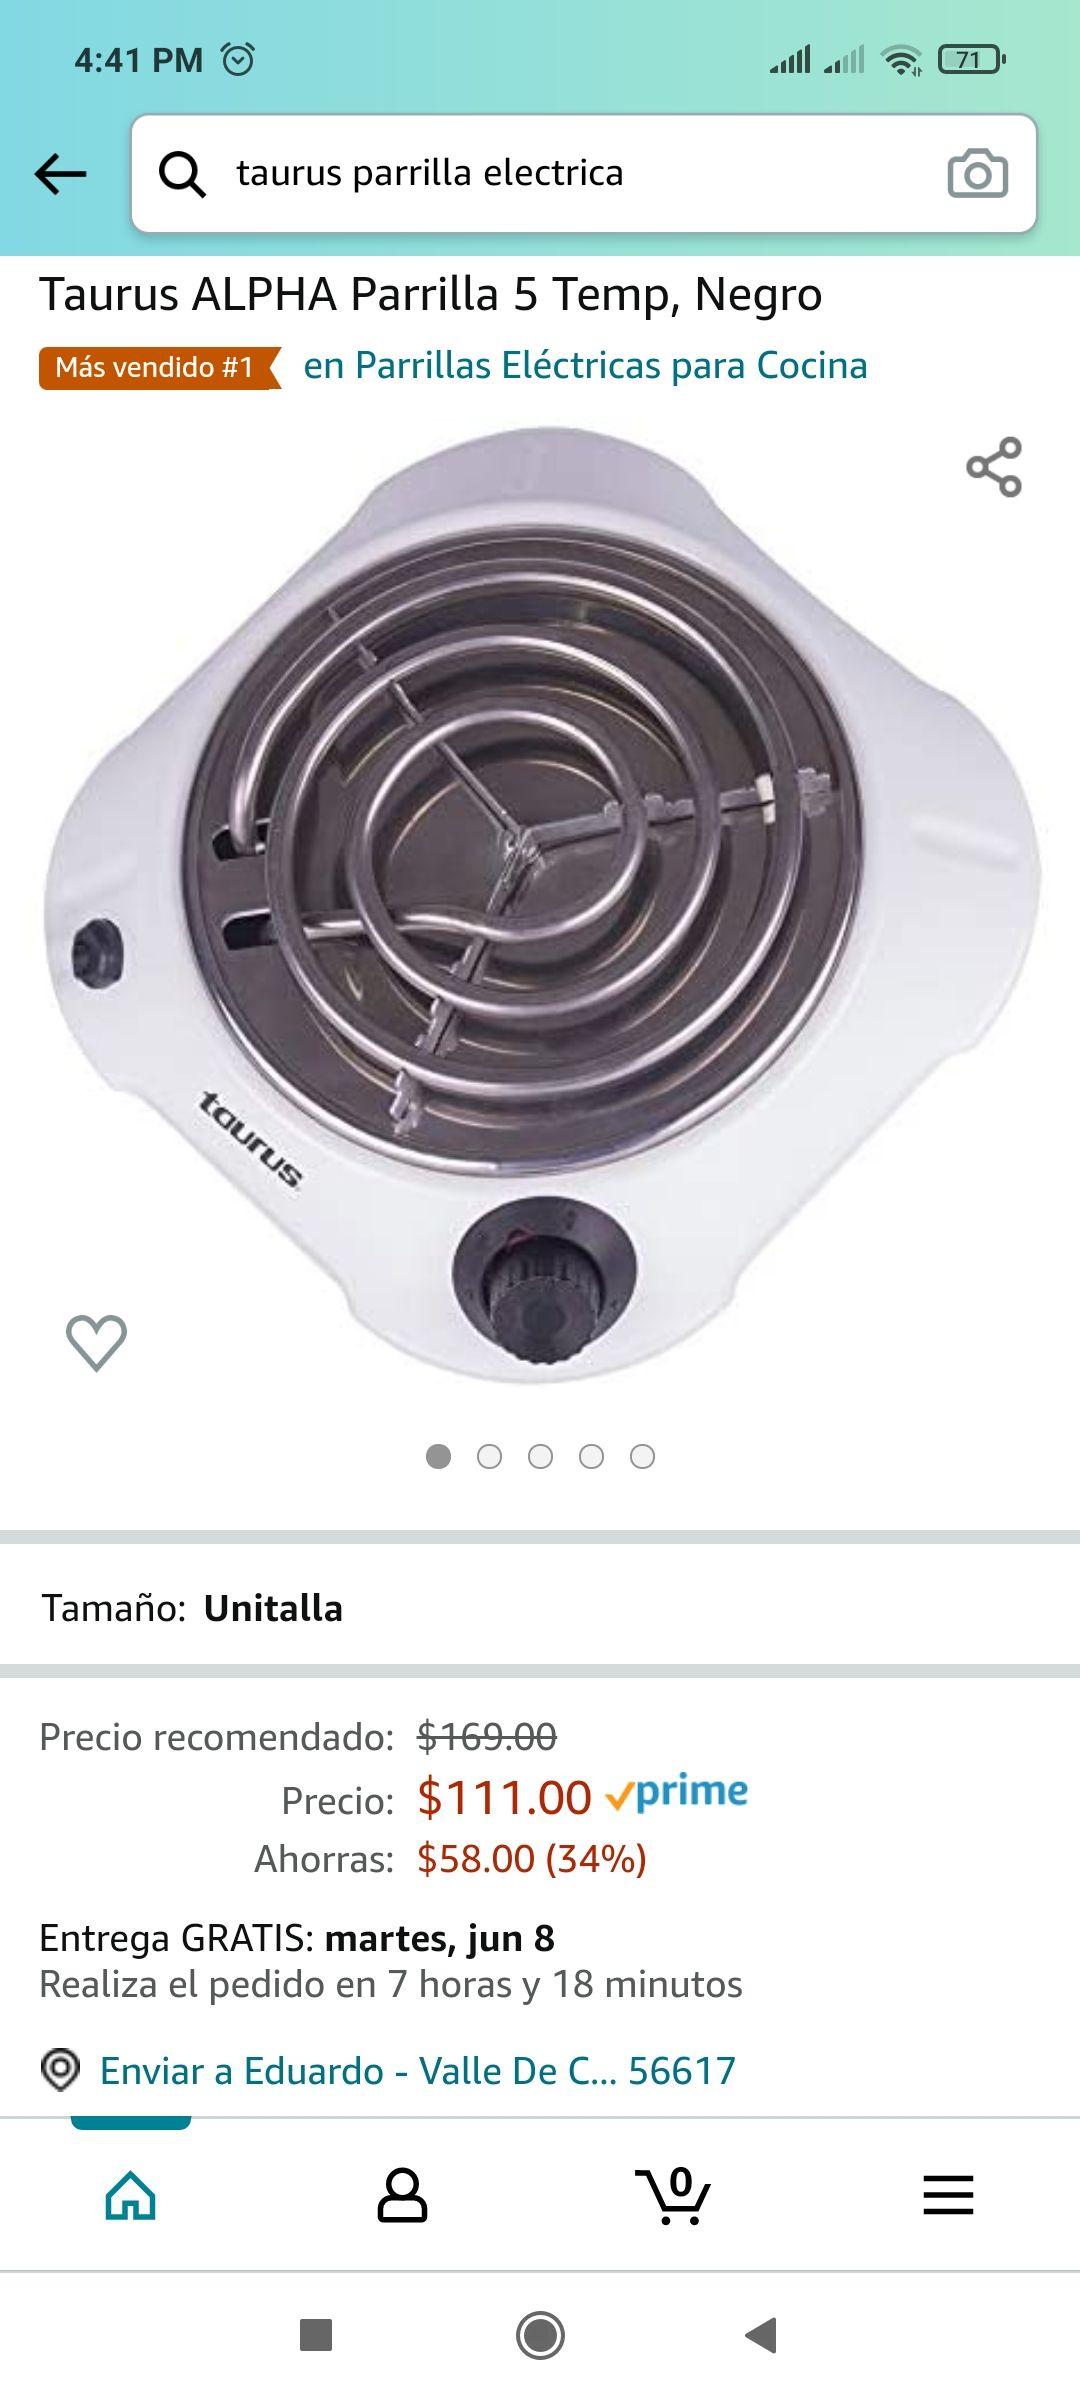 Amazon: Parrilla electrica Taurus - minimo en amazon segun keepa